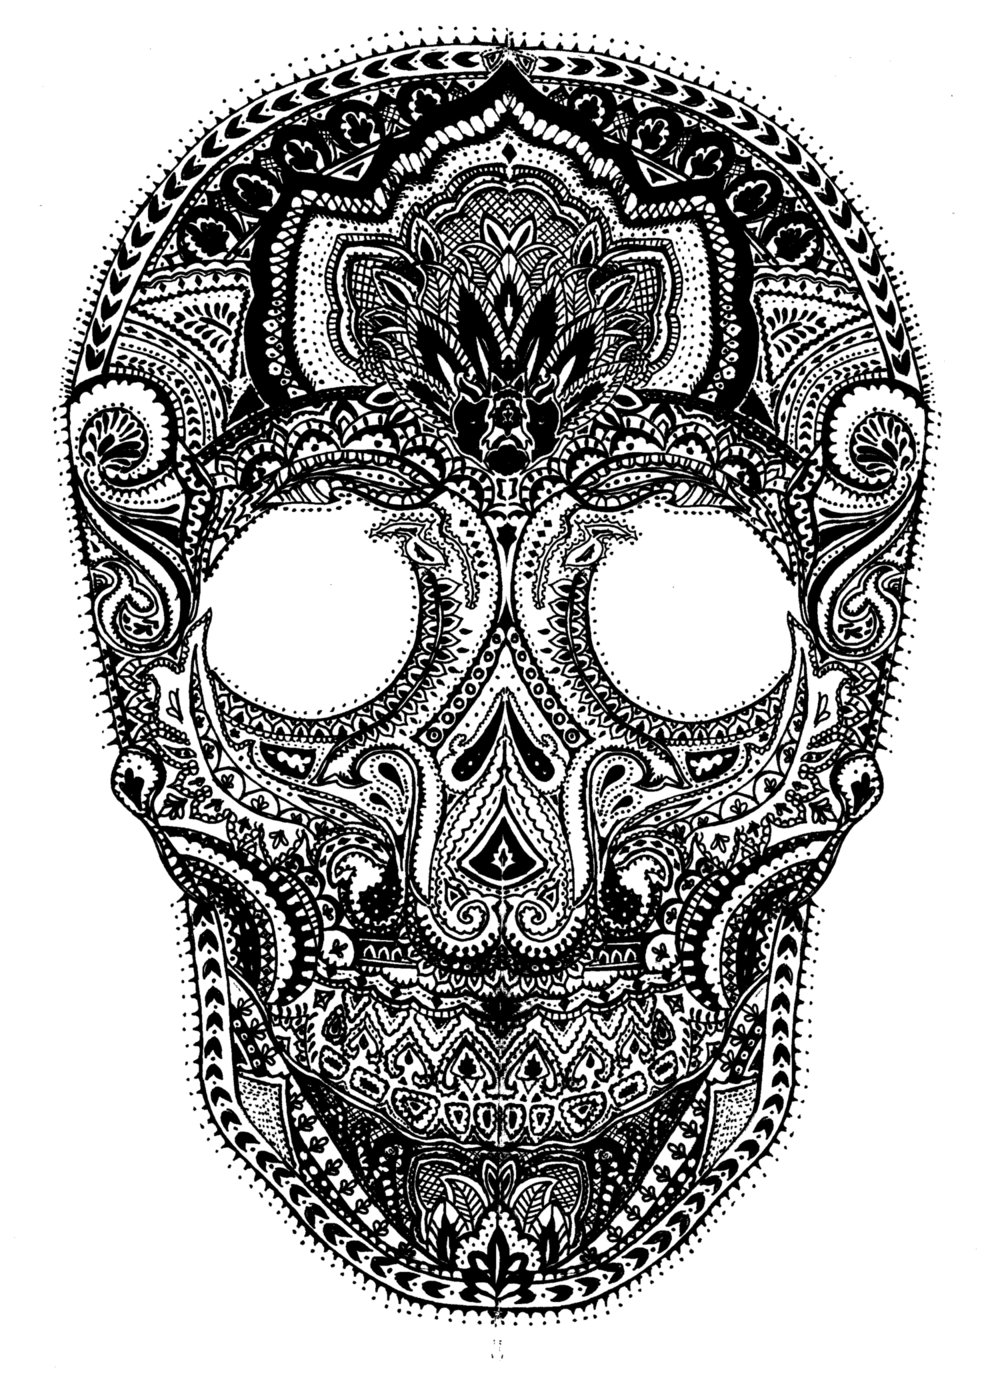 Paisley Skull Illustration: Ink on paper